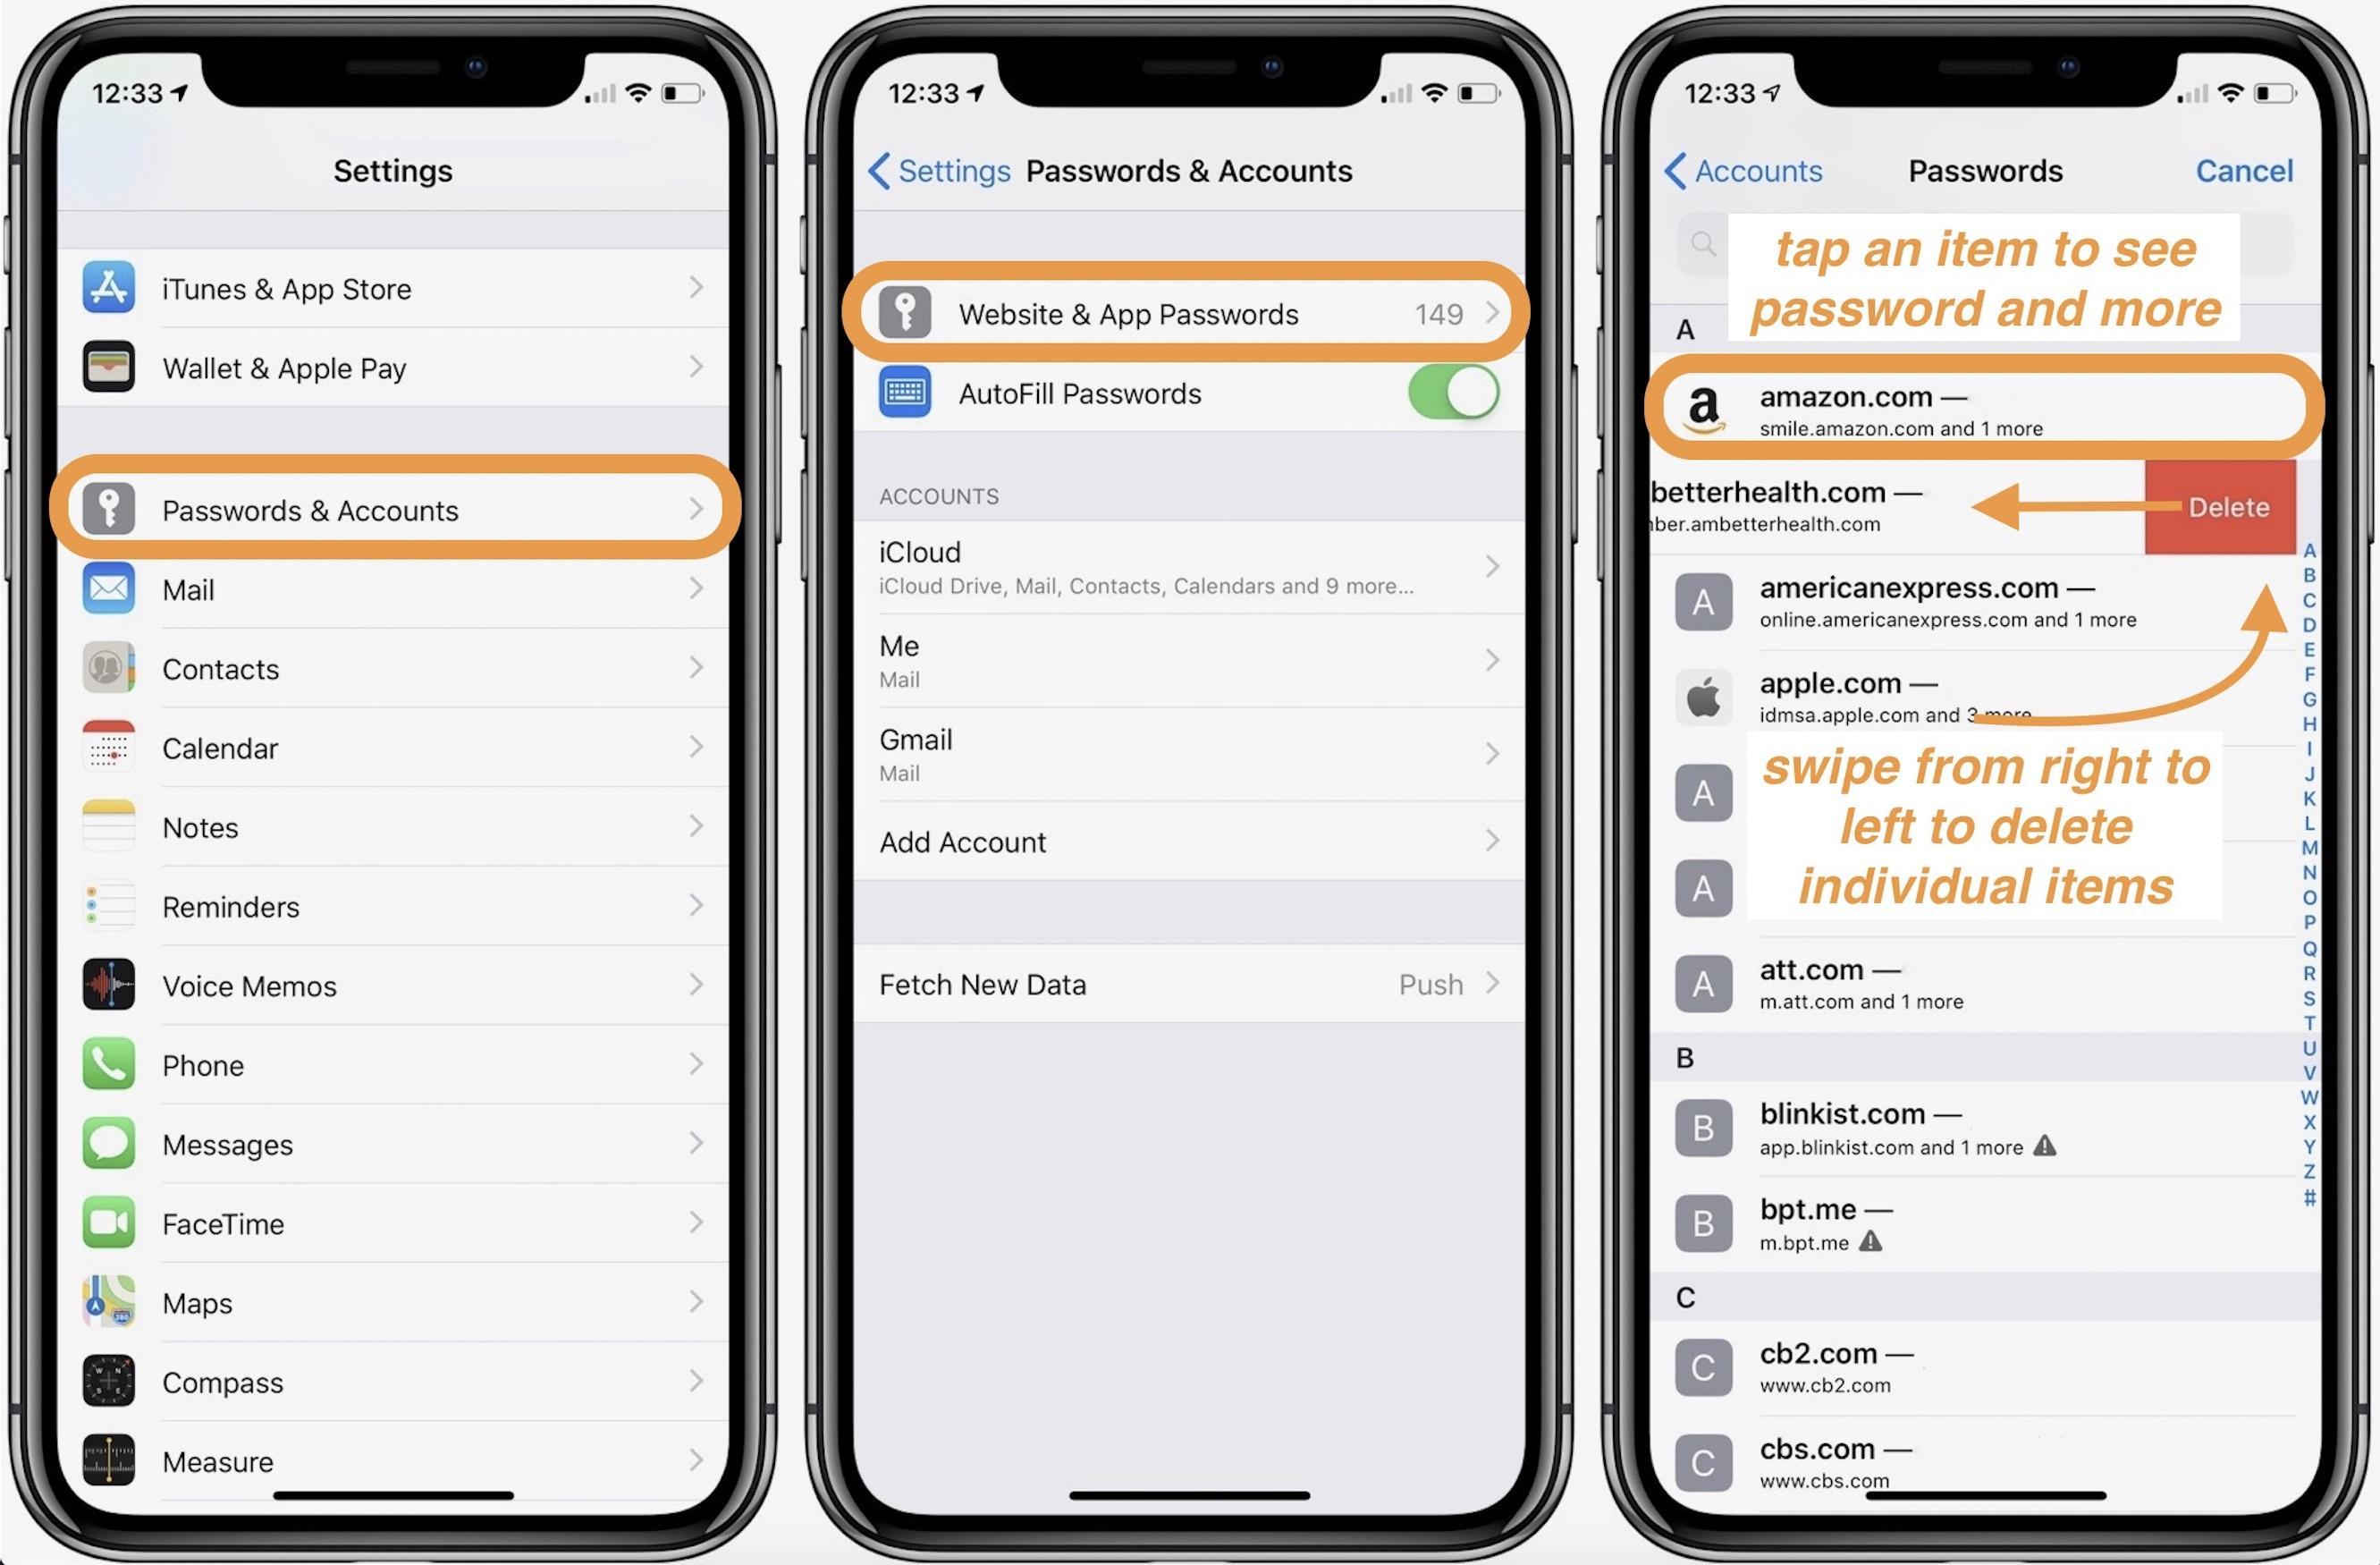 CopyTrans - Transfer iPod to iTunes, copy iPhone